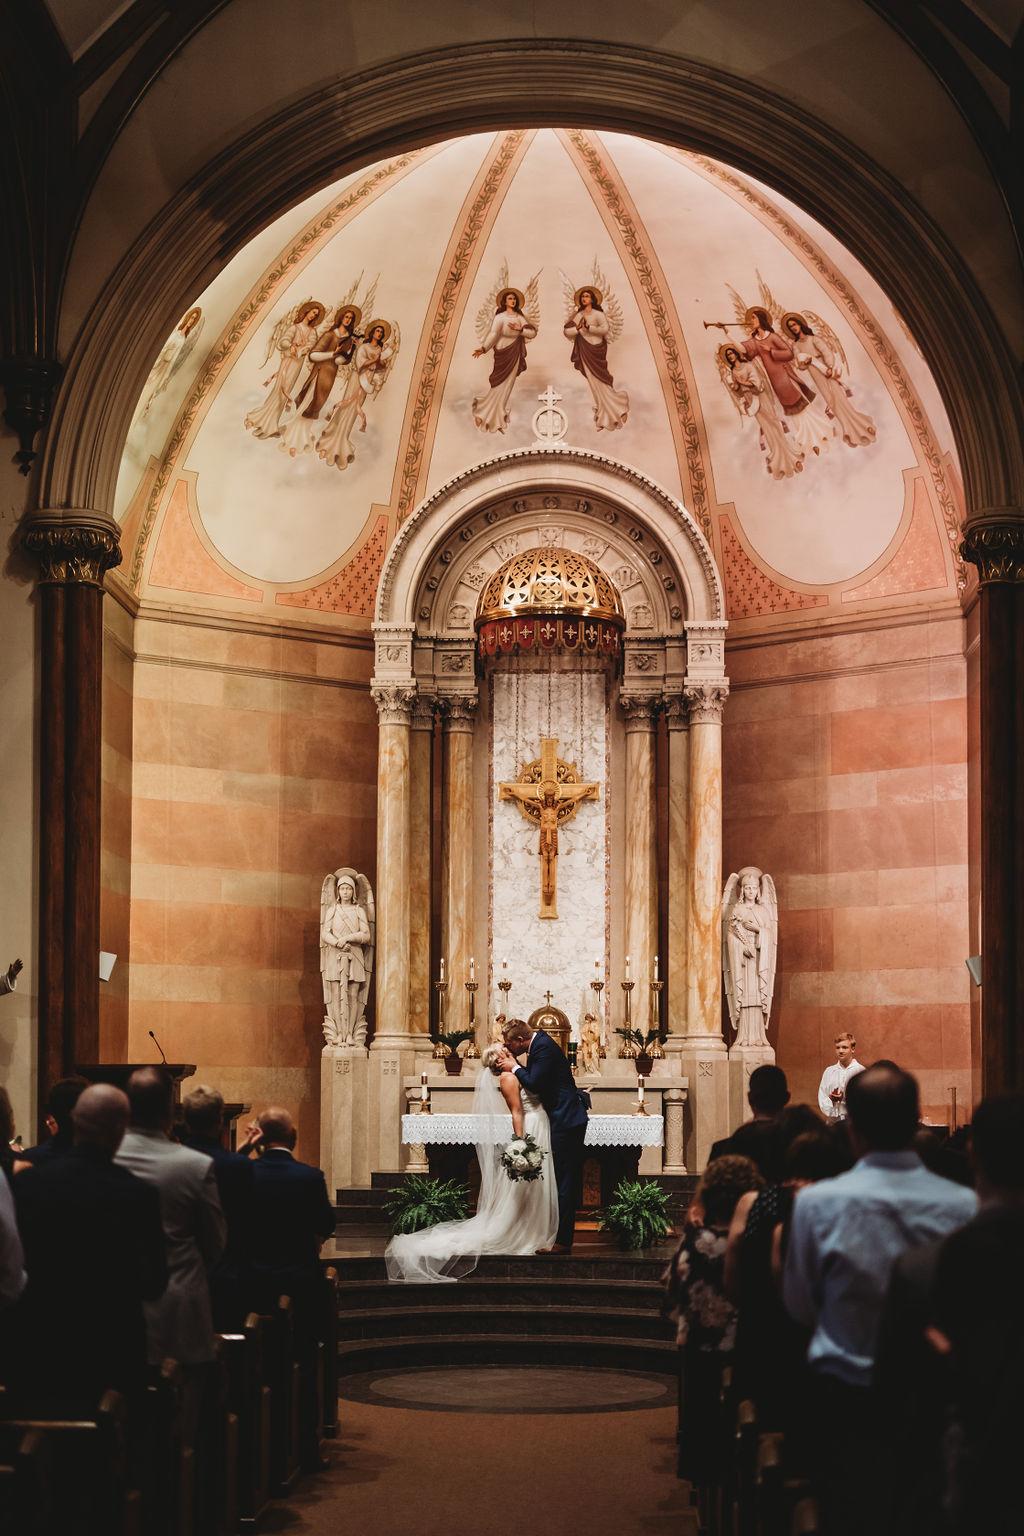 engle-olson-katie-dalton-wedding-clewell-photography-39.jpg